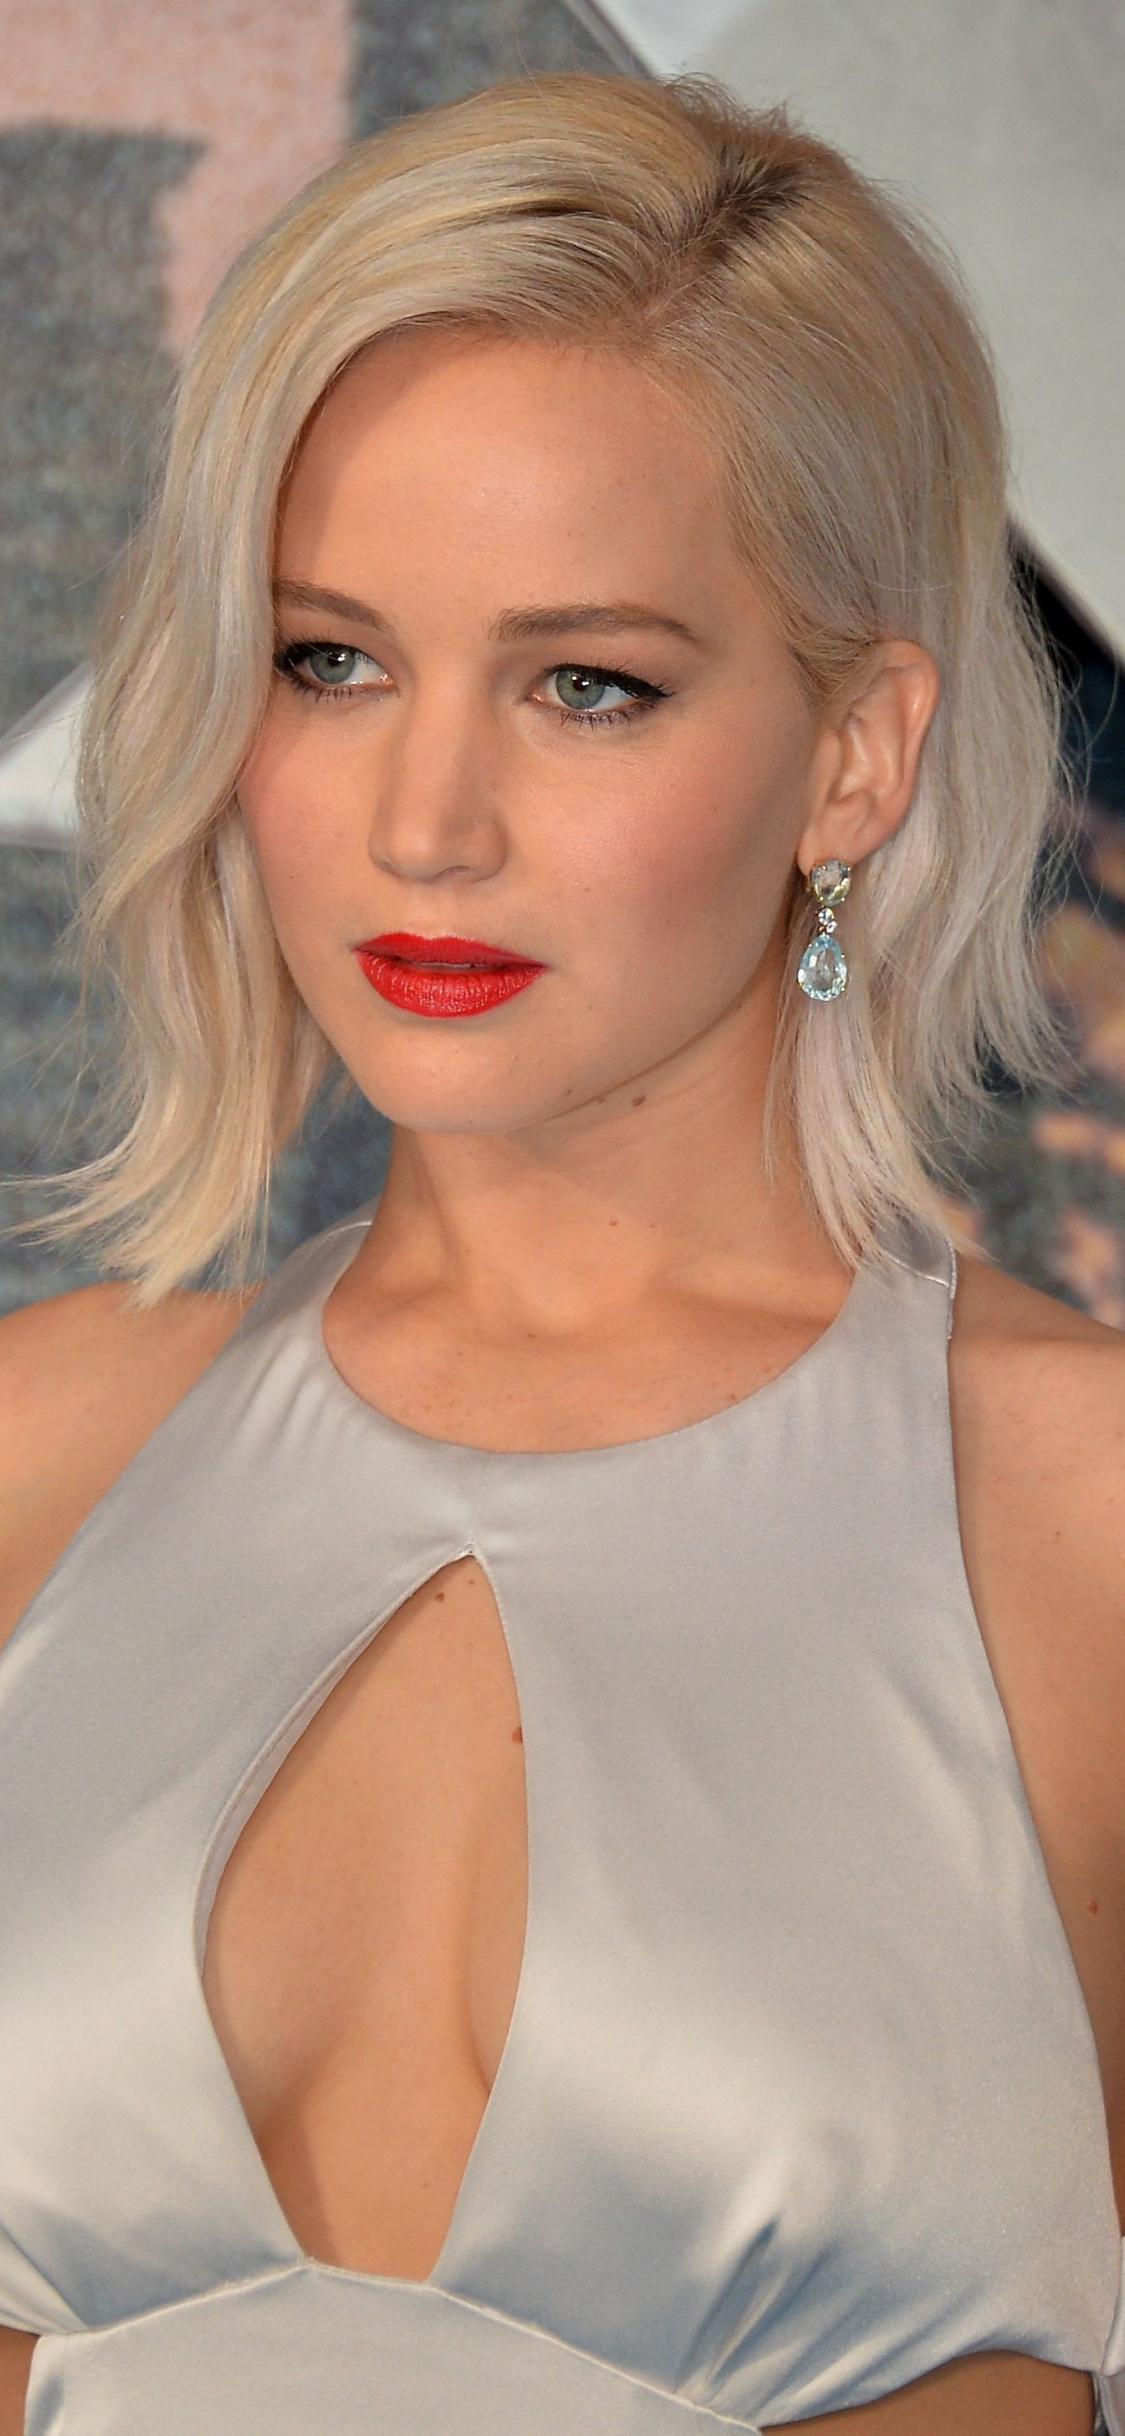 Jennifer Lawrence, Short Hair, Gorgeous, Wallpaper - Jennifer Lawrence Iphone X , HD Wallpaper & Backgrounds